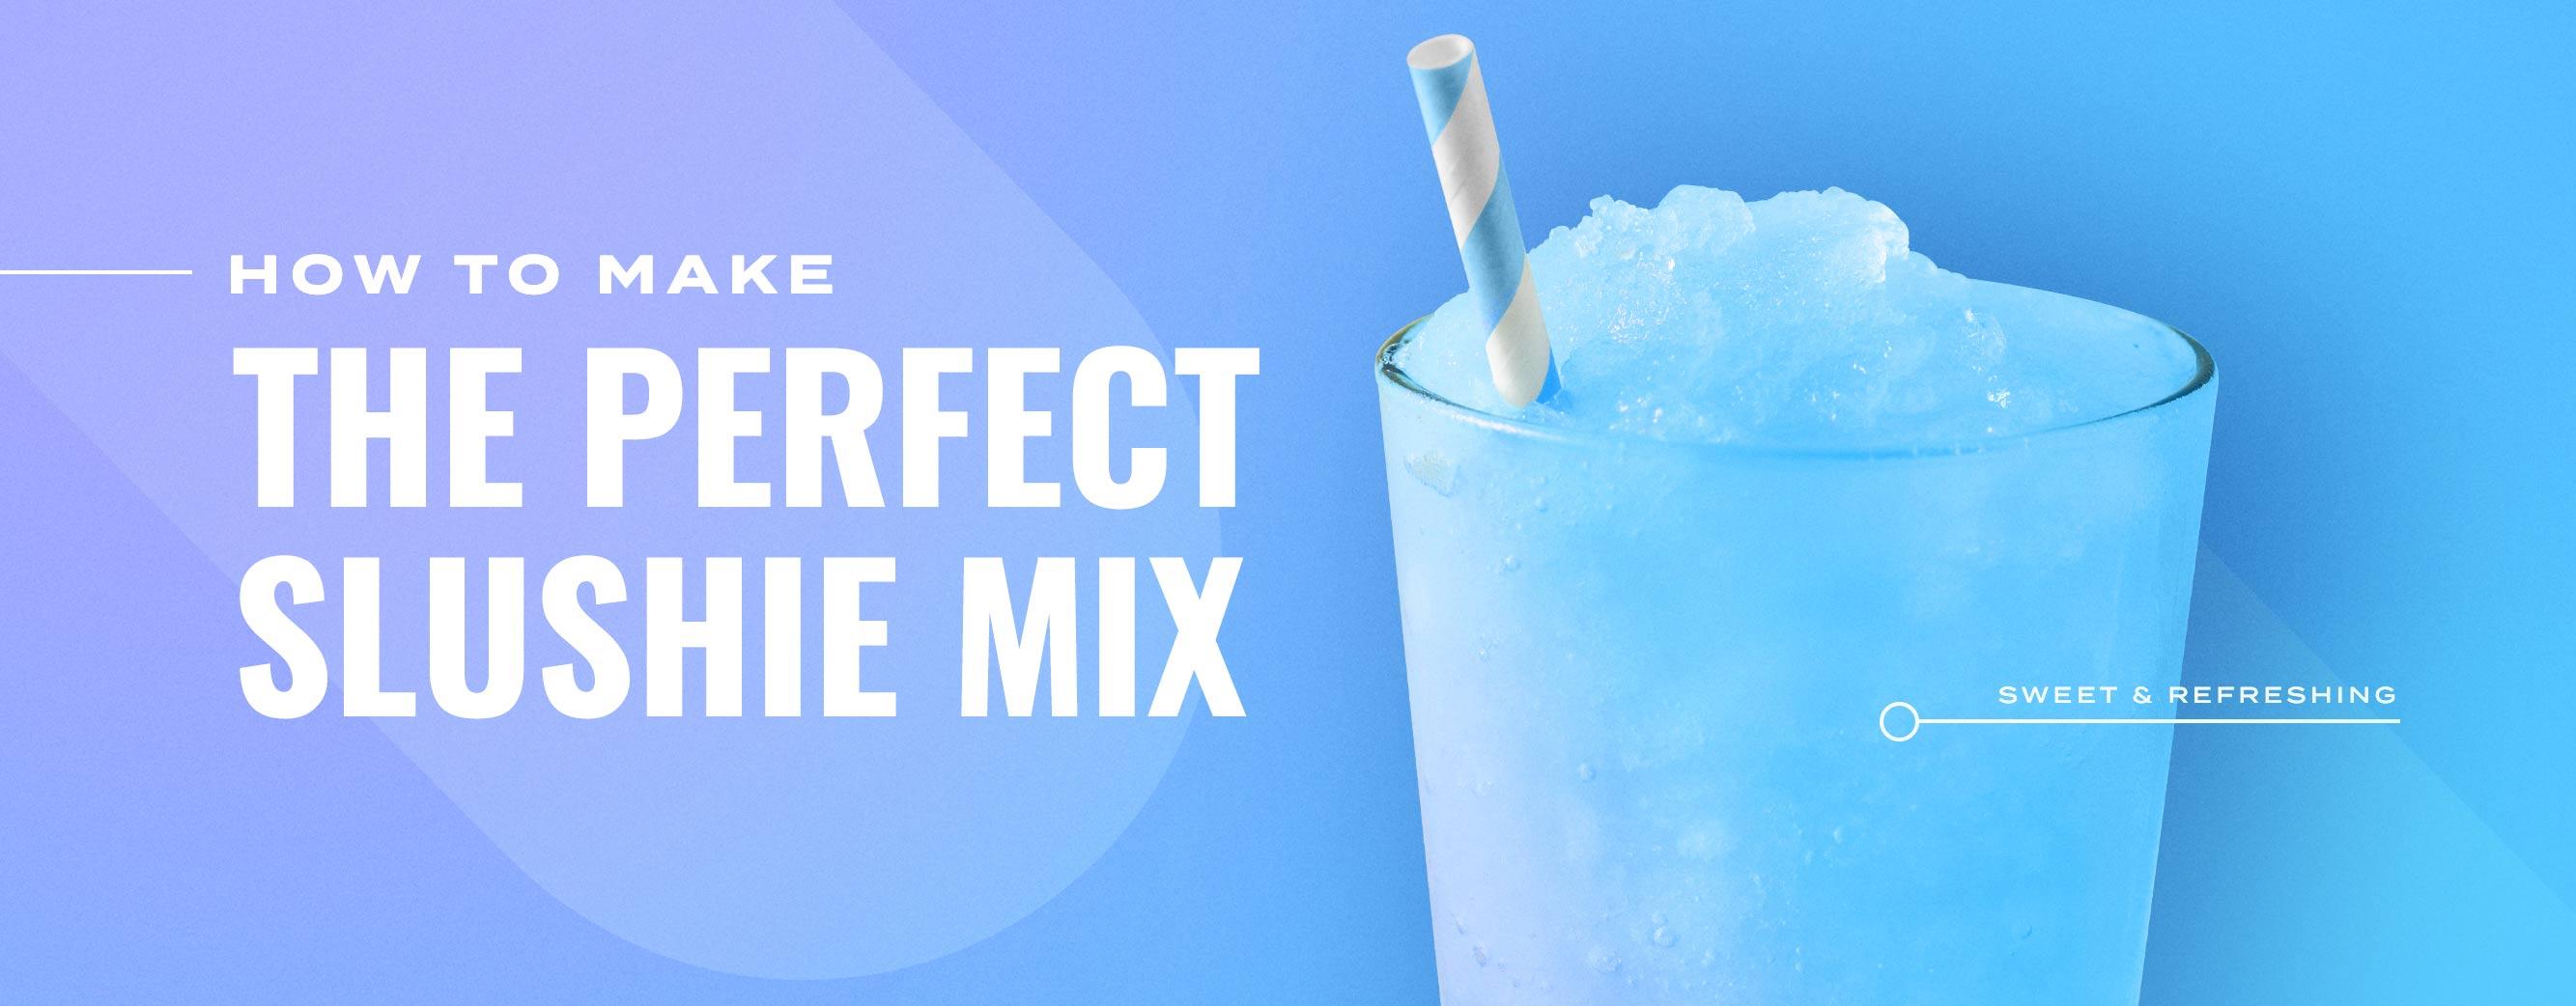 How to Make Your Own Slushie Mix